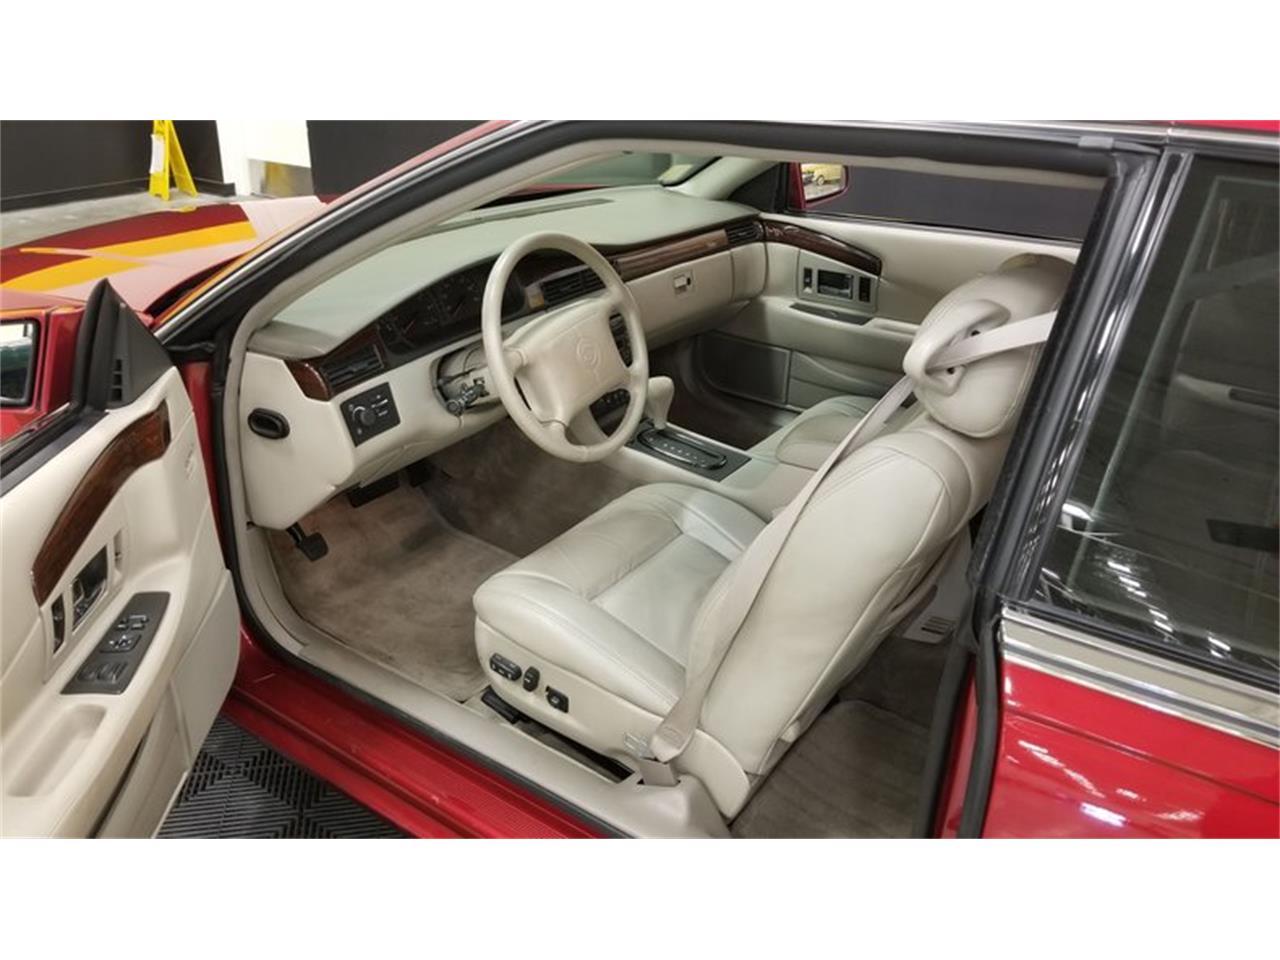 1999 Cadillac Eldorado (CC-1373890) for sale in Mankato, Minnesota